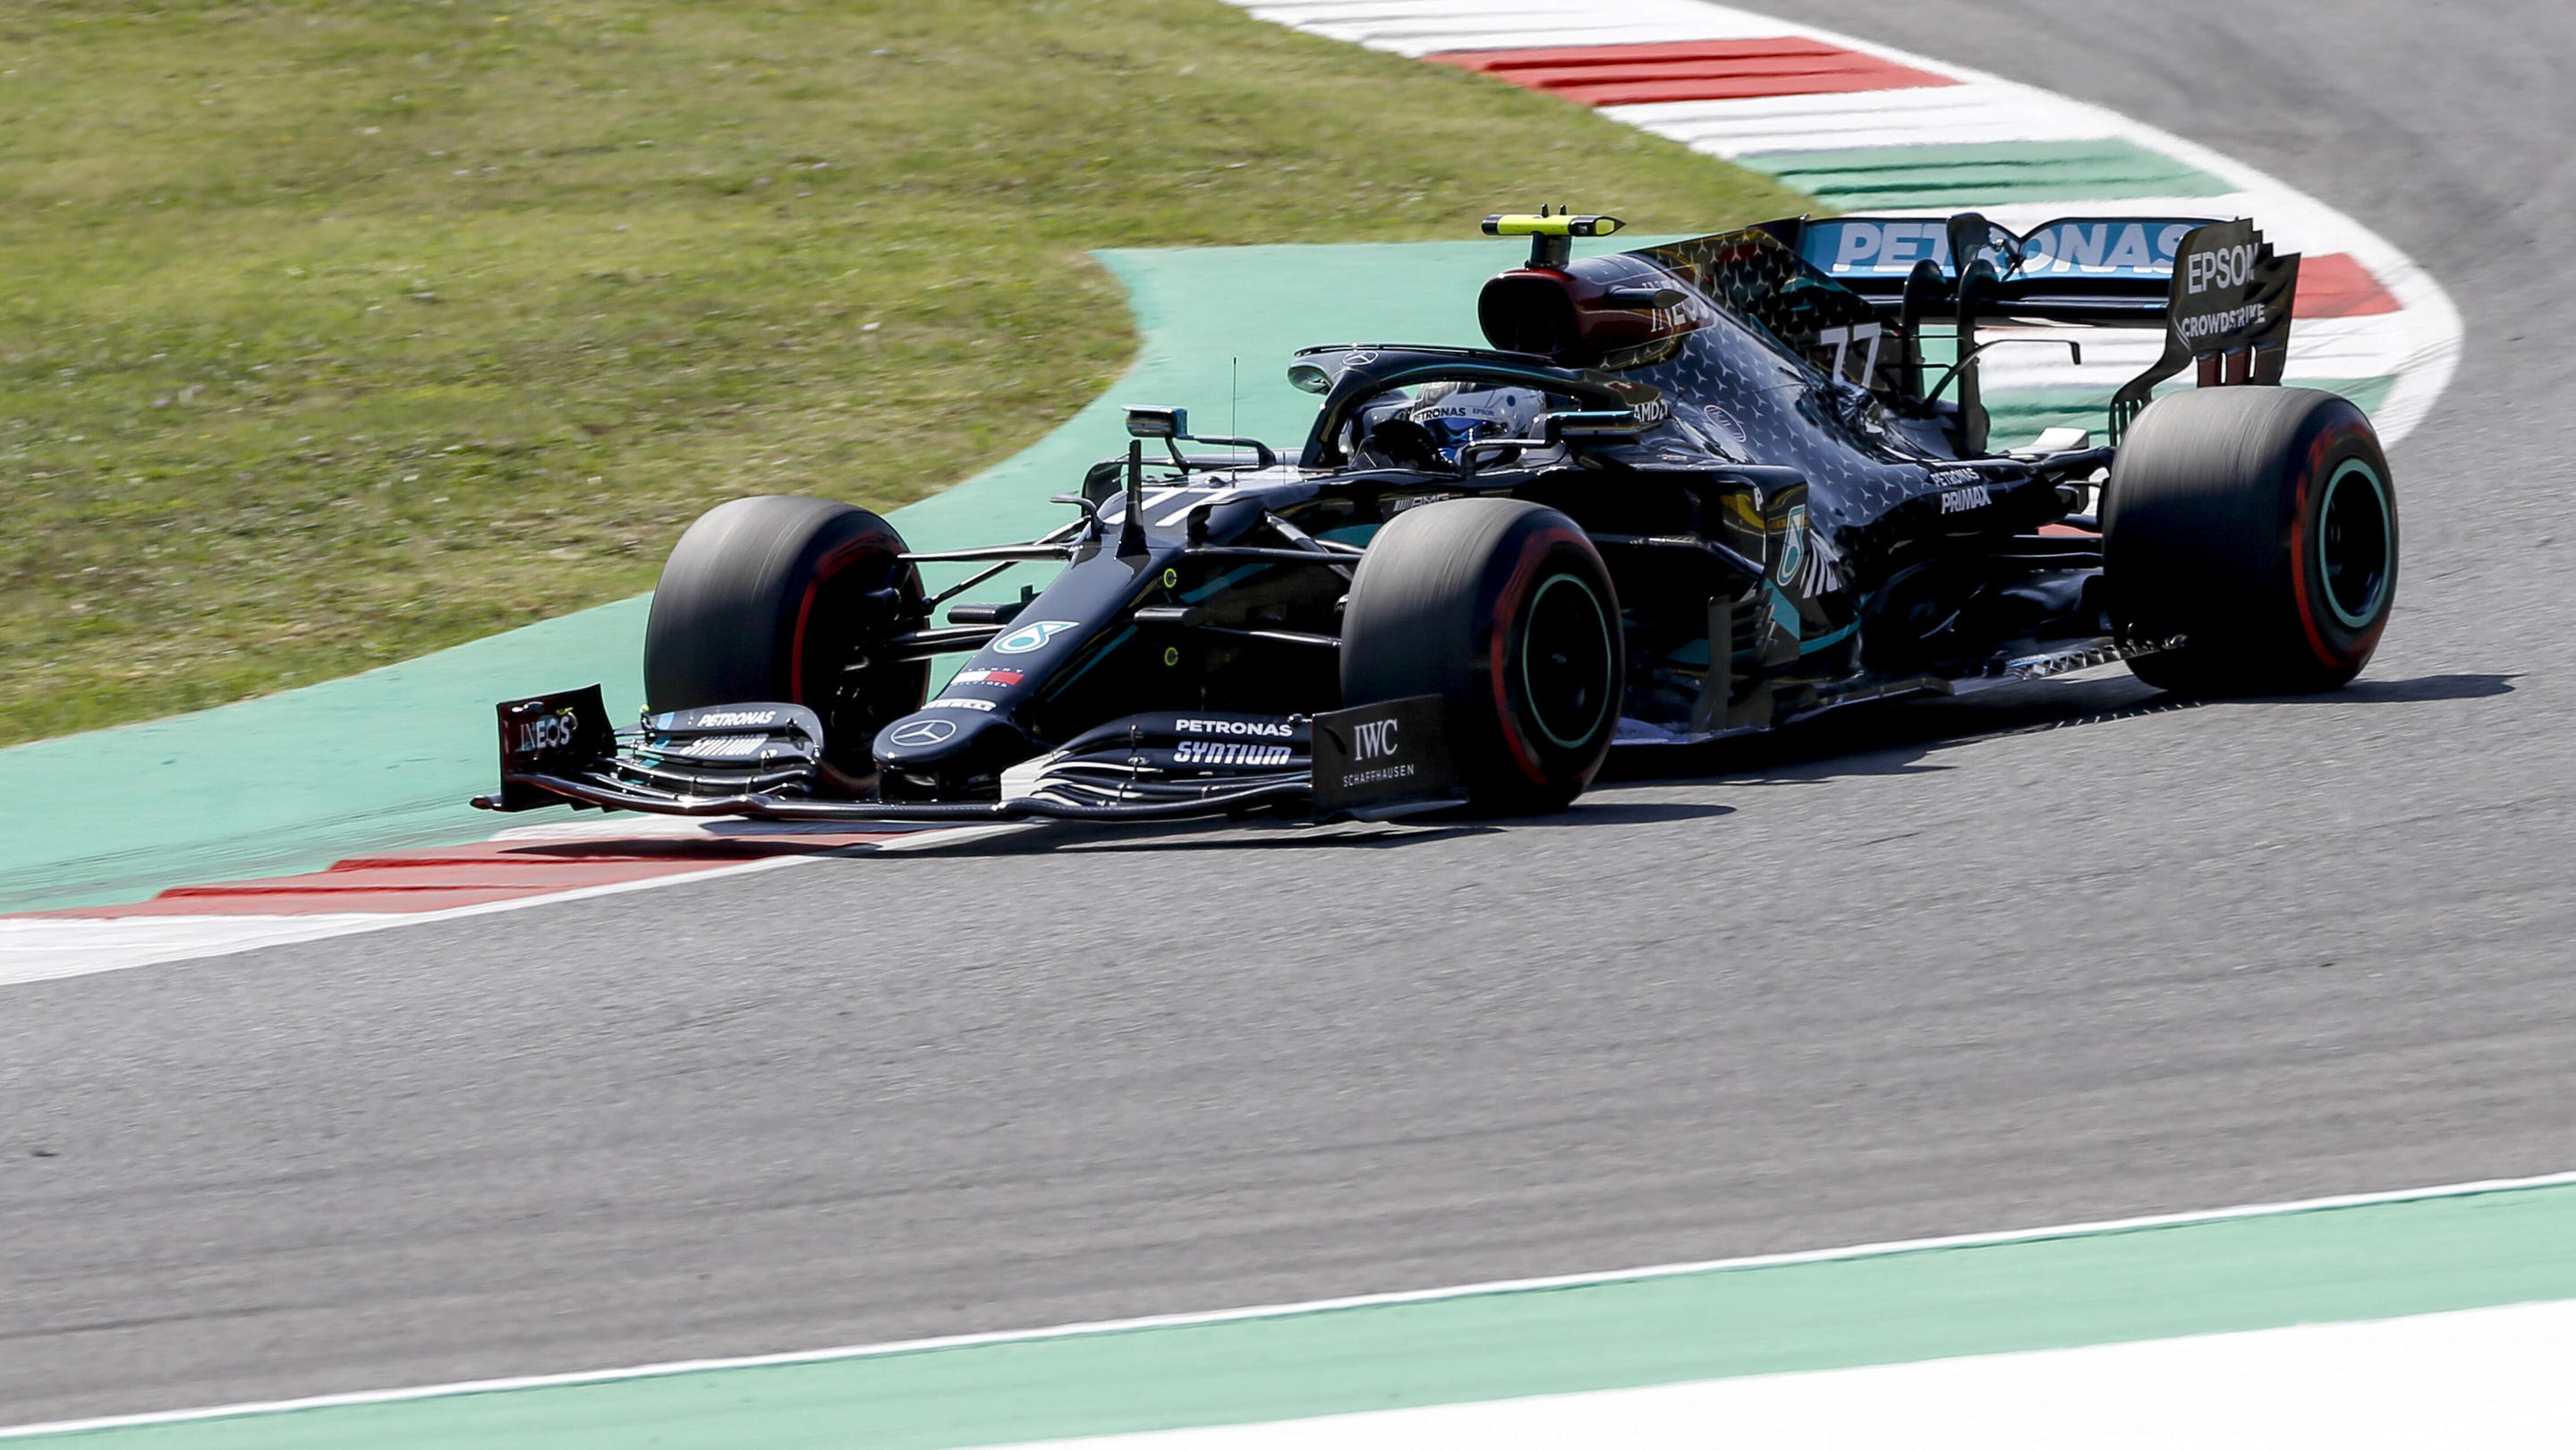 2. Freies Training in Mugello: Mercedes dominiert, Ferrari wieder weit hinten